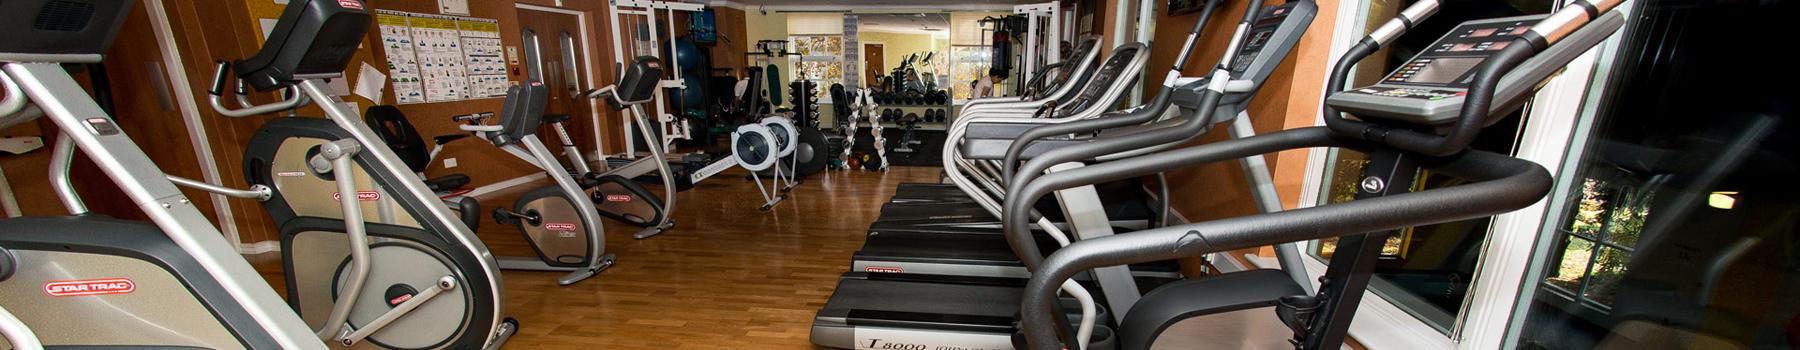 Fitness Club Sales: Making Memberships Count